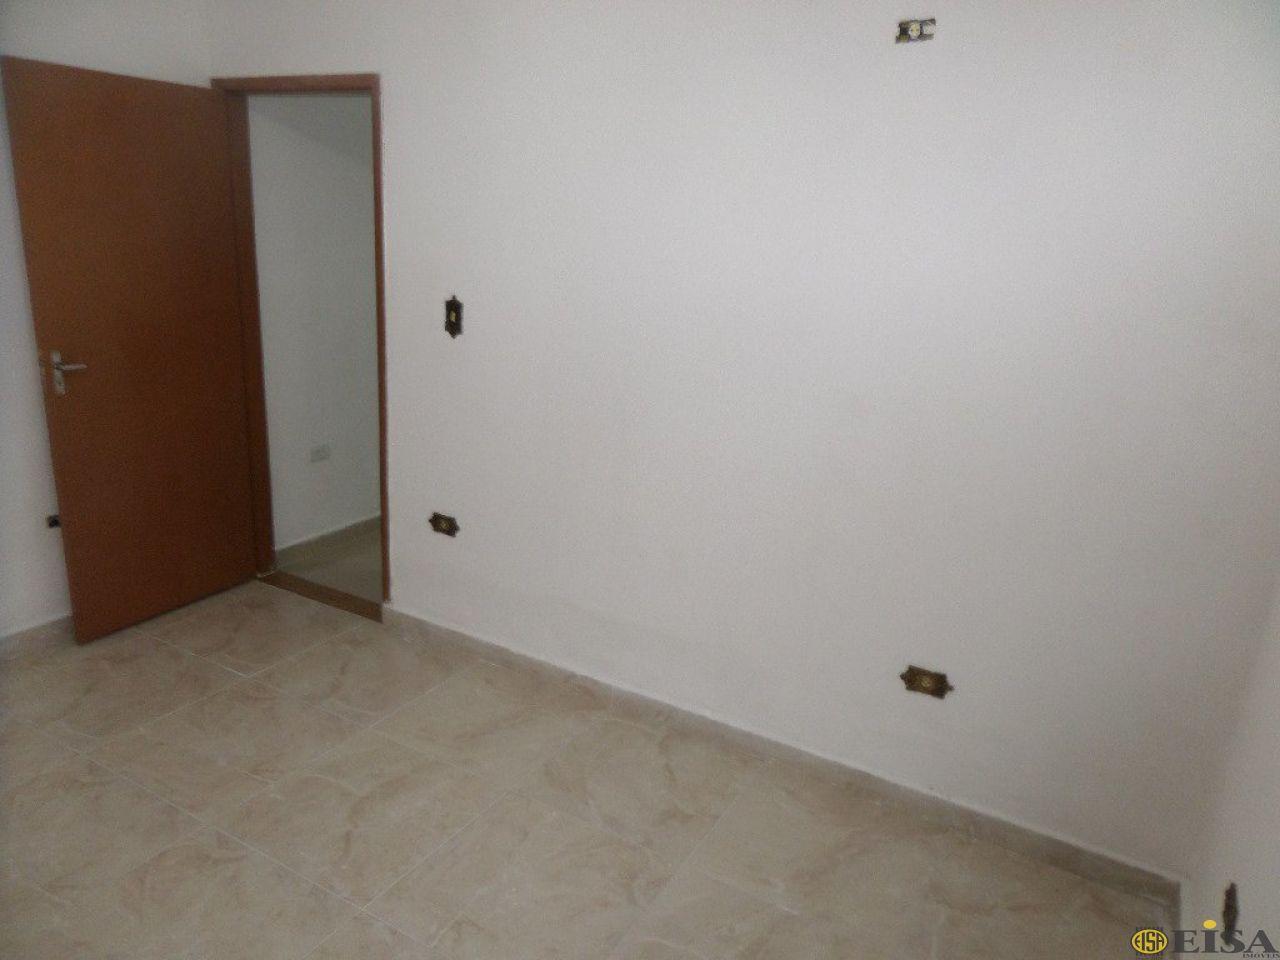 CASA TéRREA - JARDIM BRASIL ZONA NORTE , SãO PAULO - SP | CÓD.: EJ4127